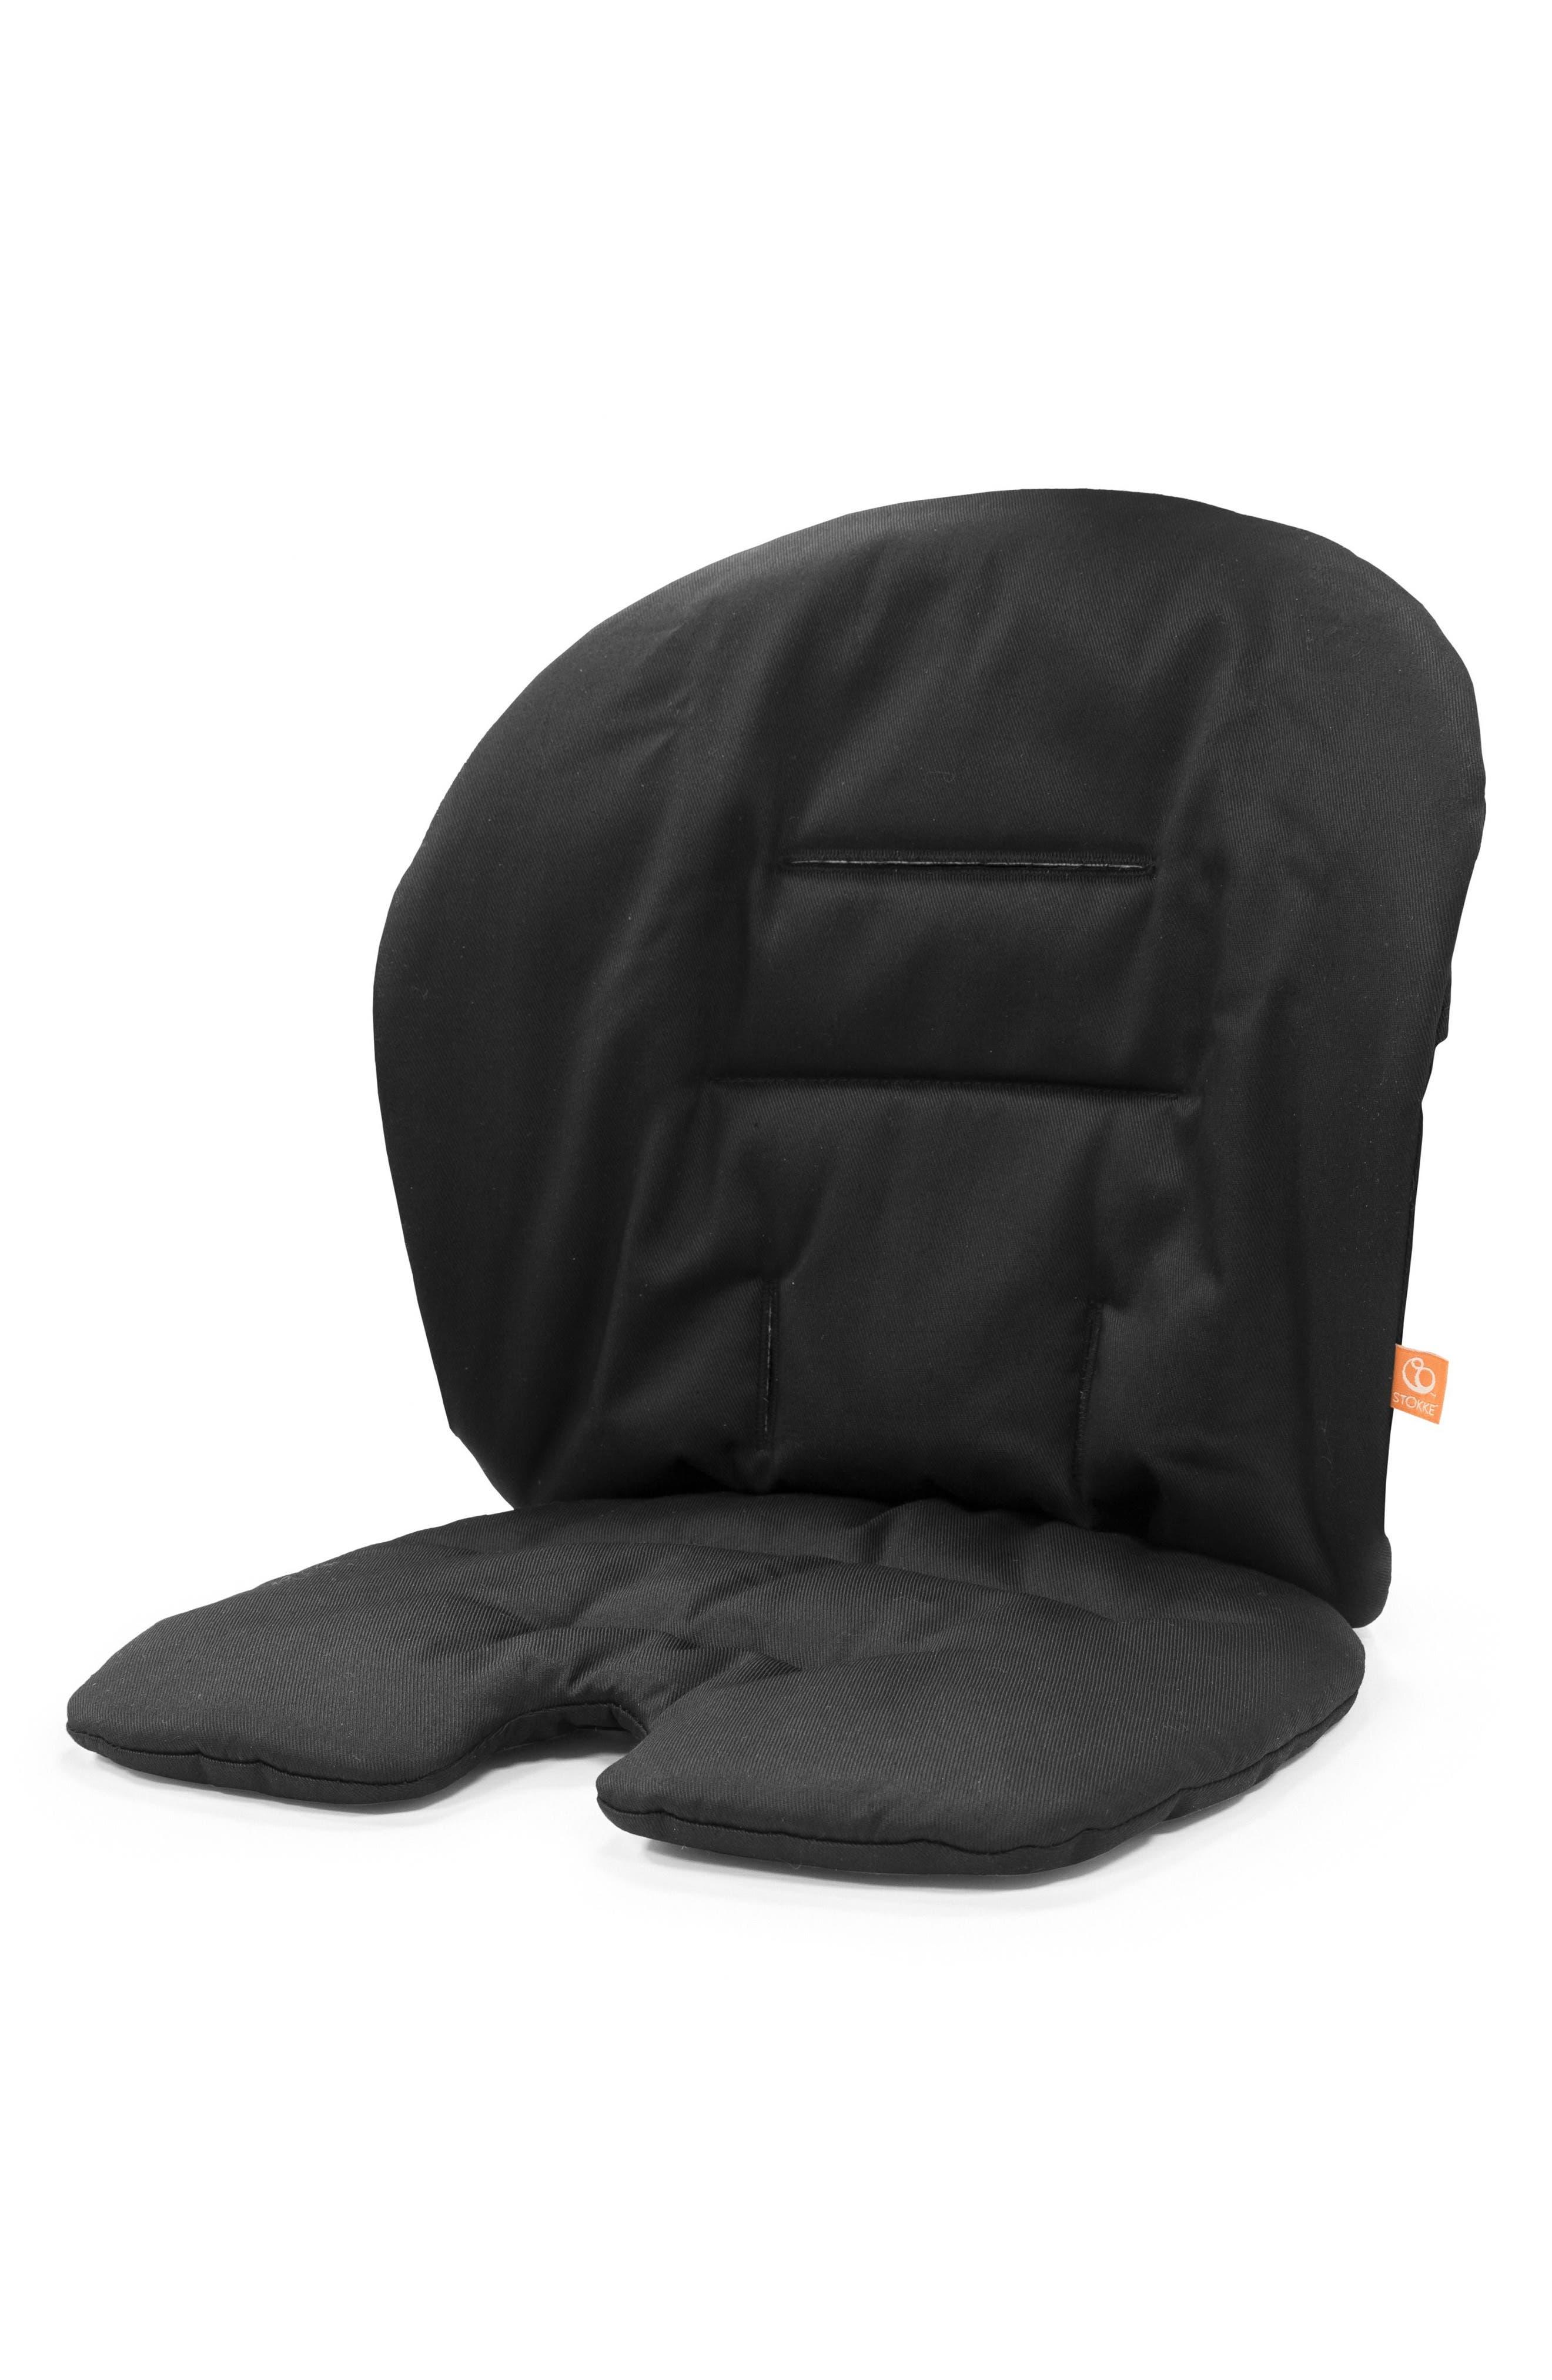 'Steps<sup>™</sup>' Seat Cushion,                         Main,                         color, Black